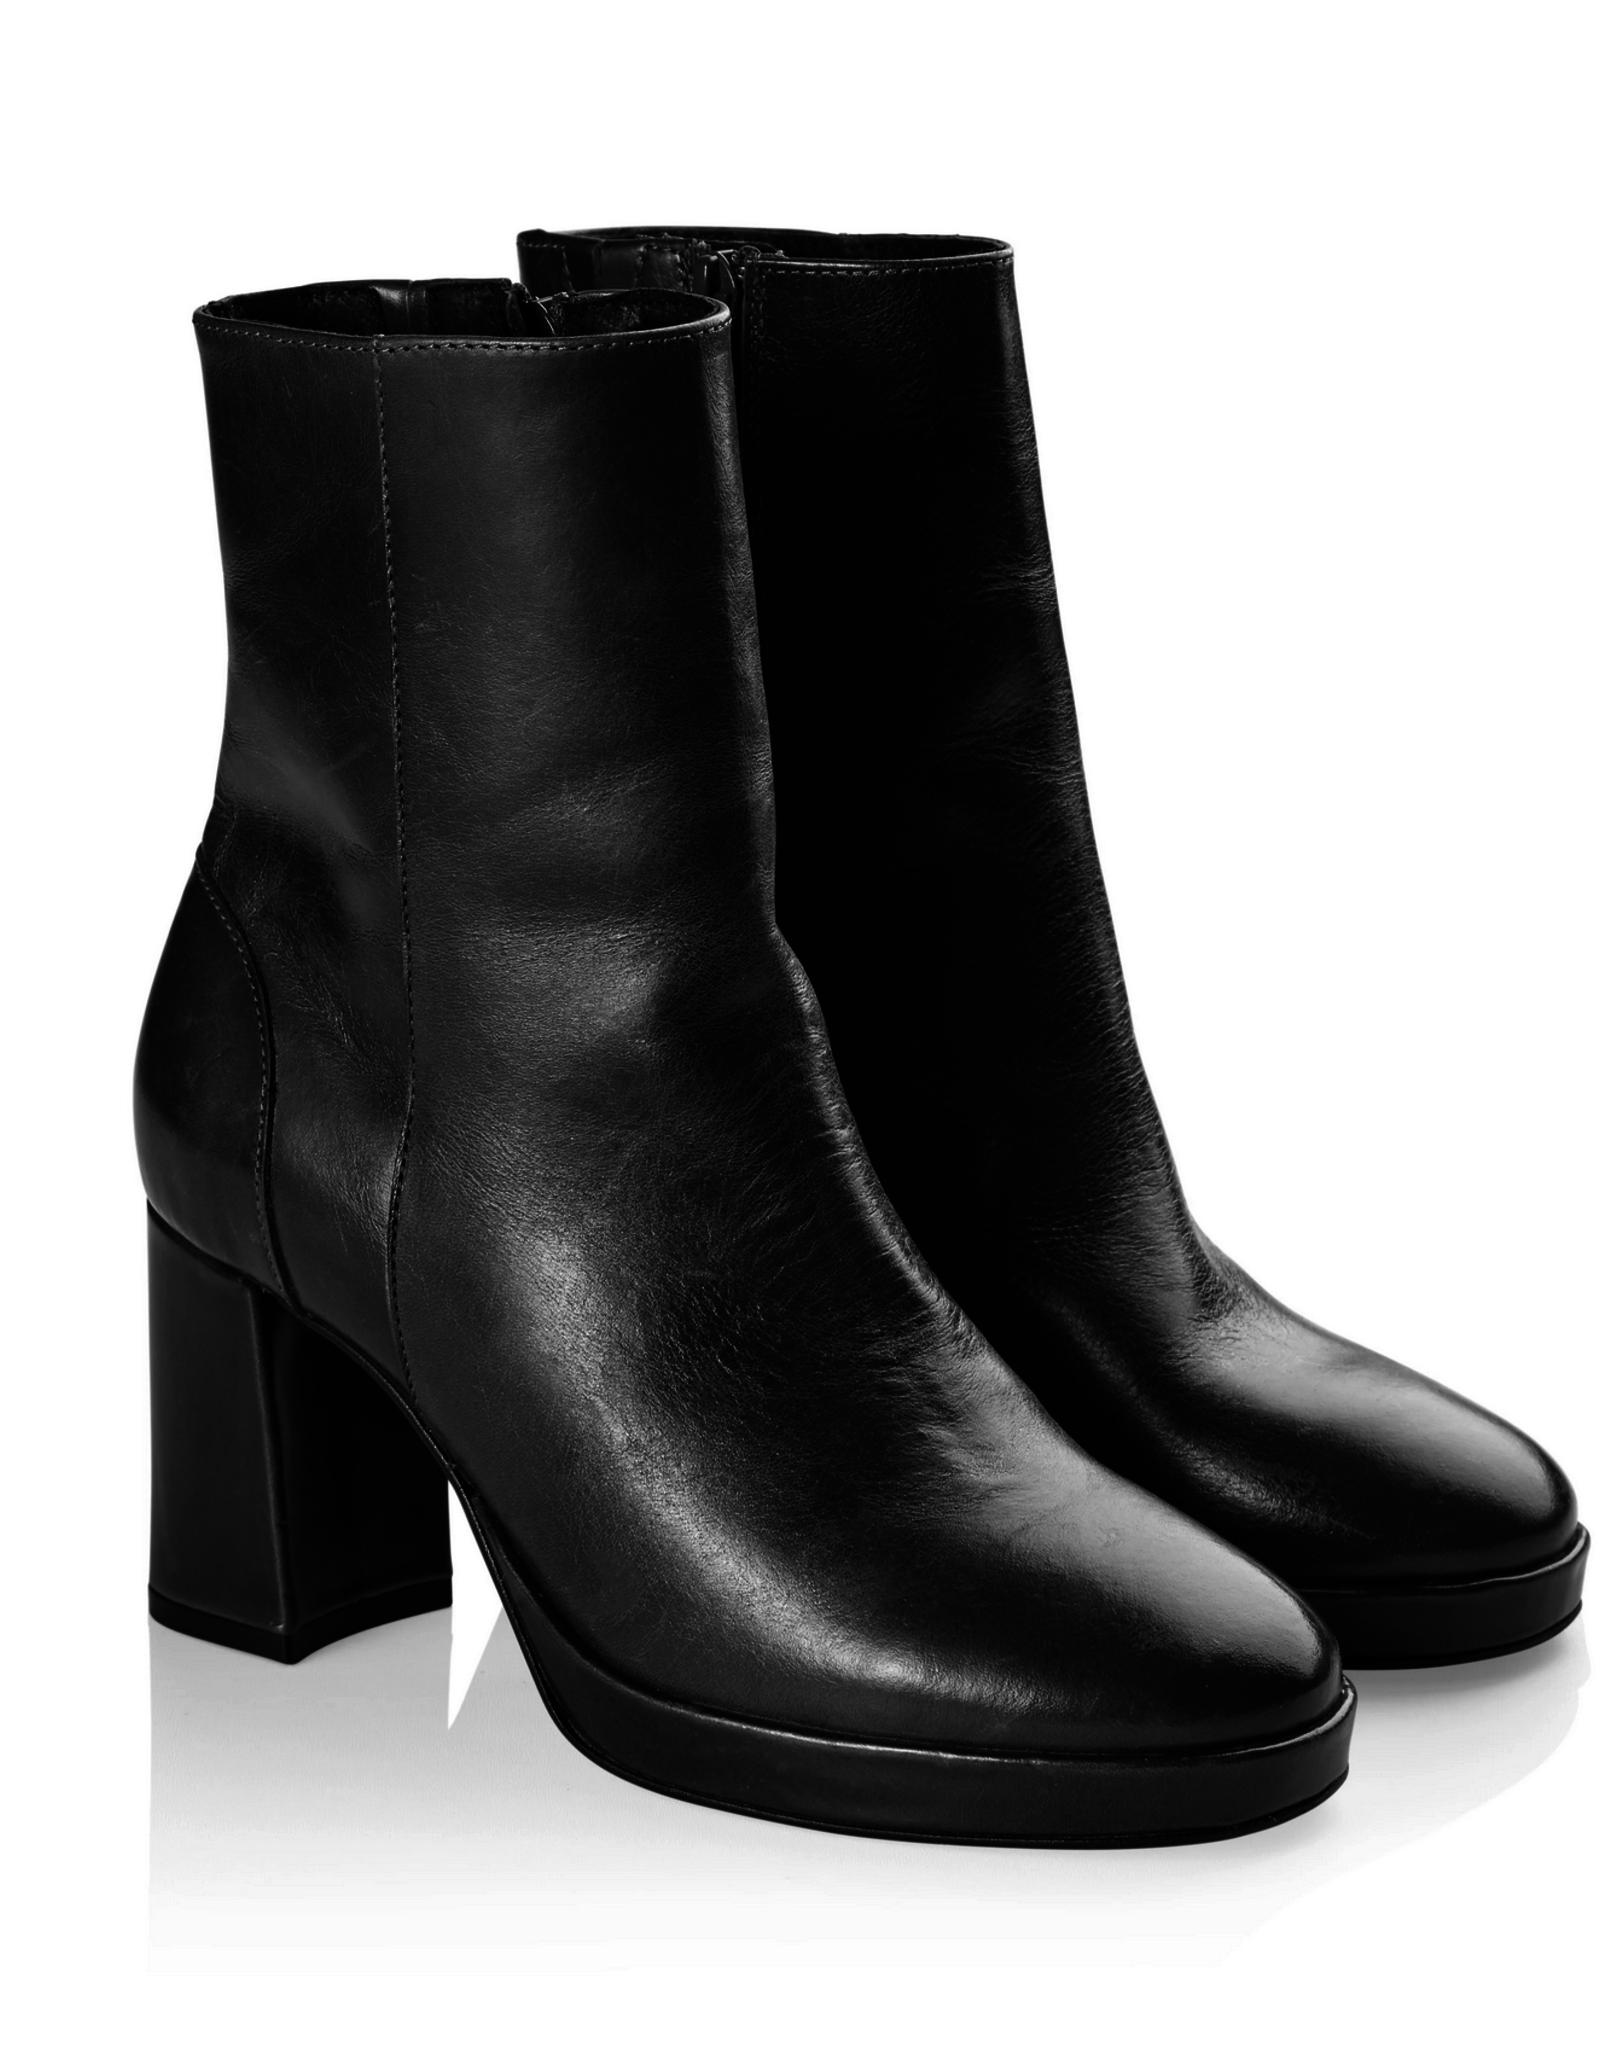 Pavement Asta leather black